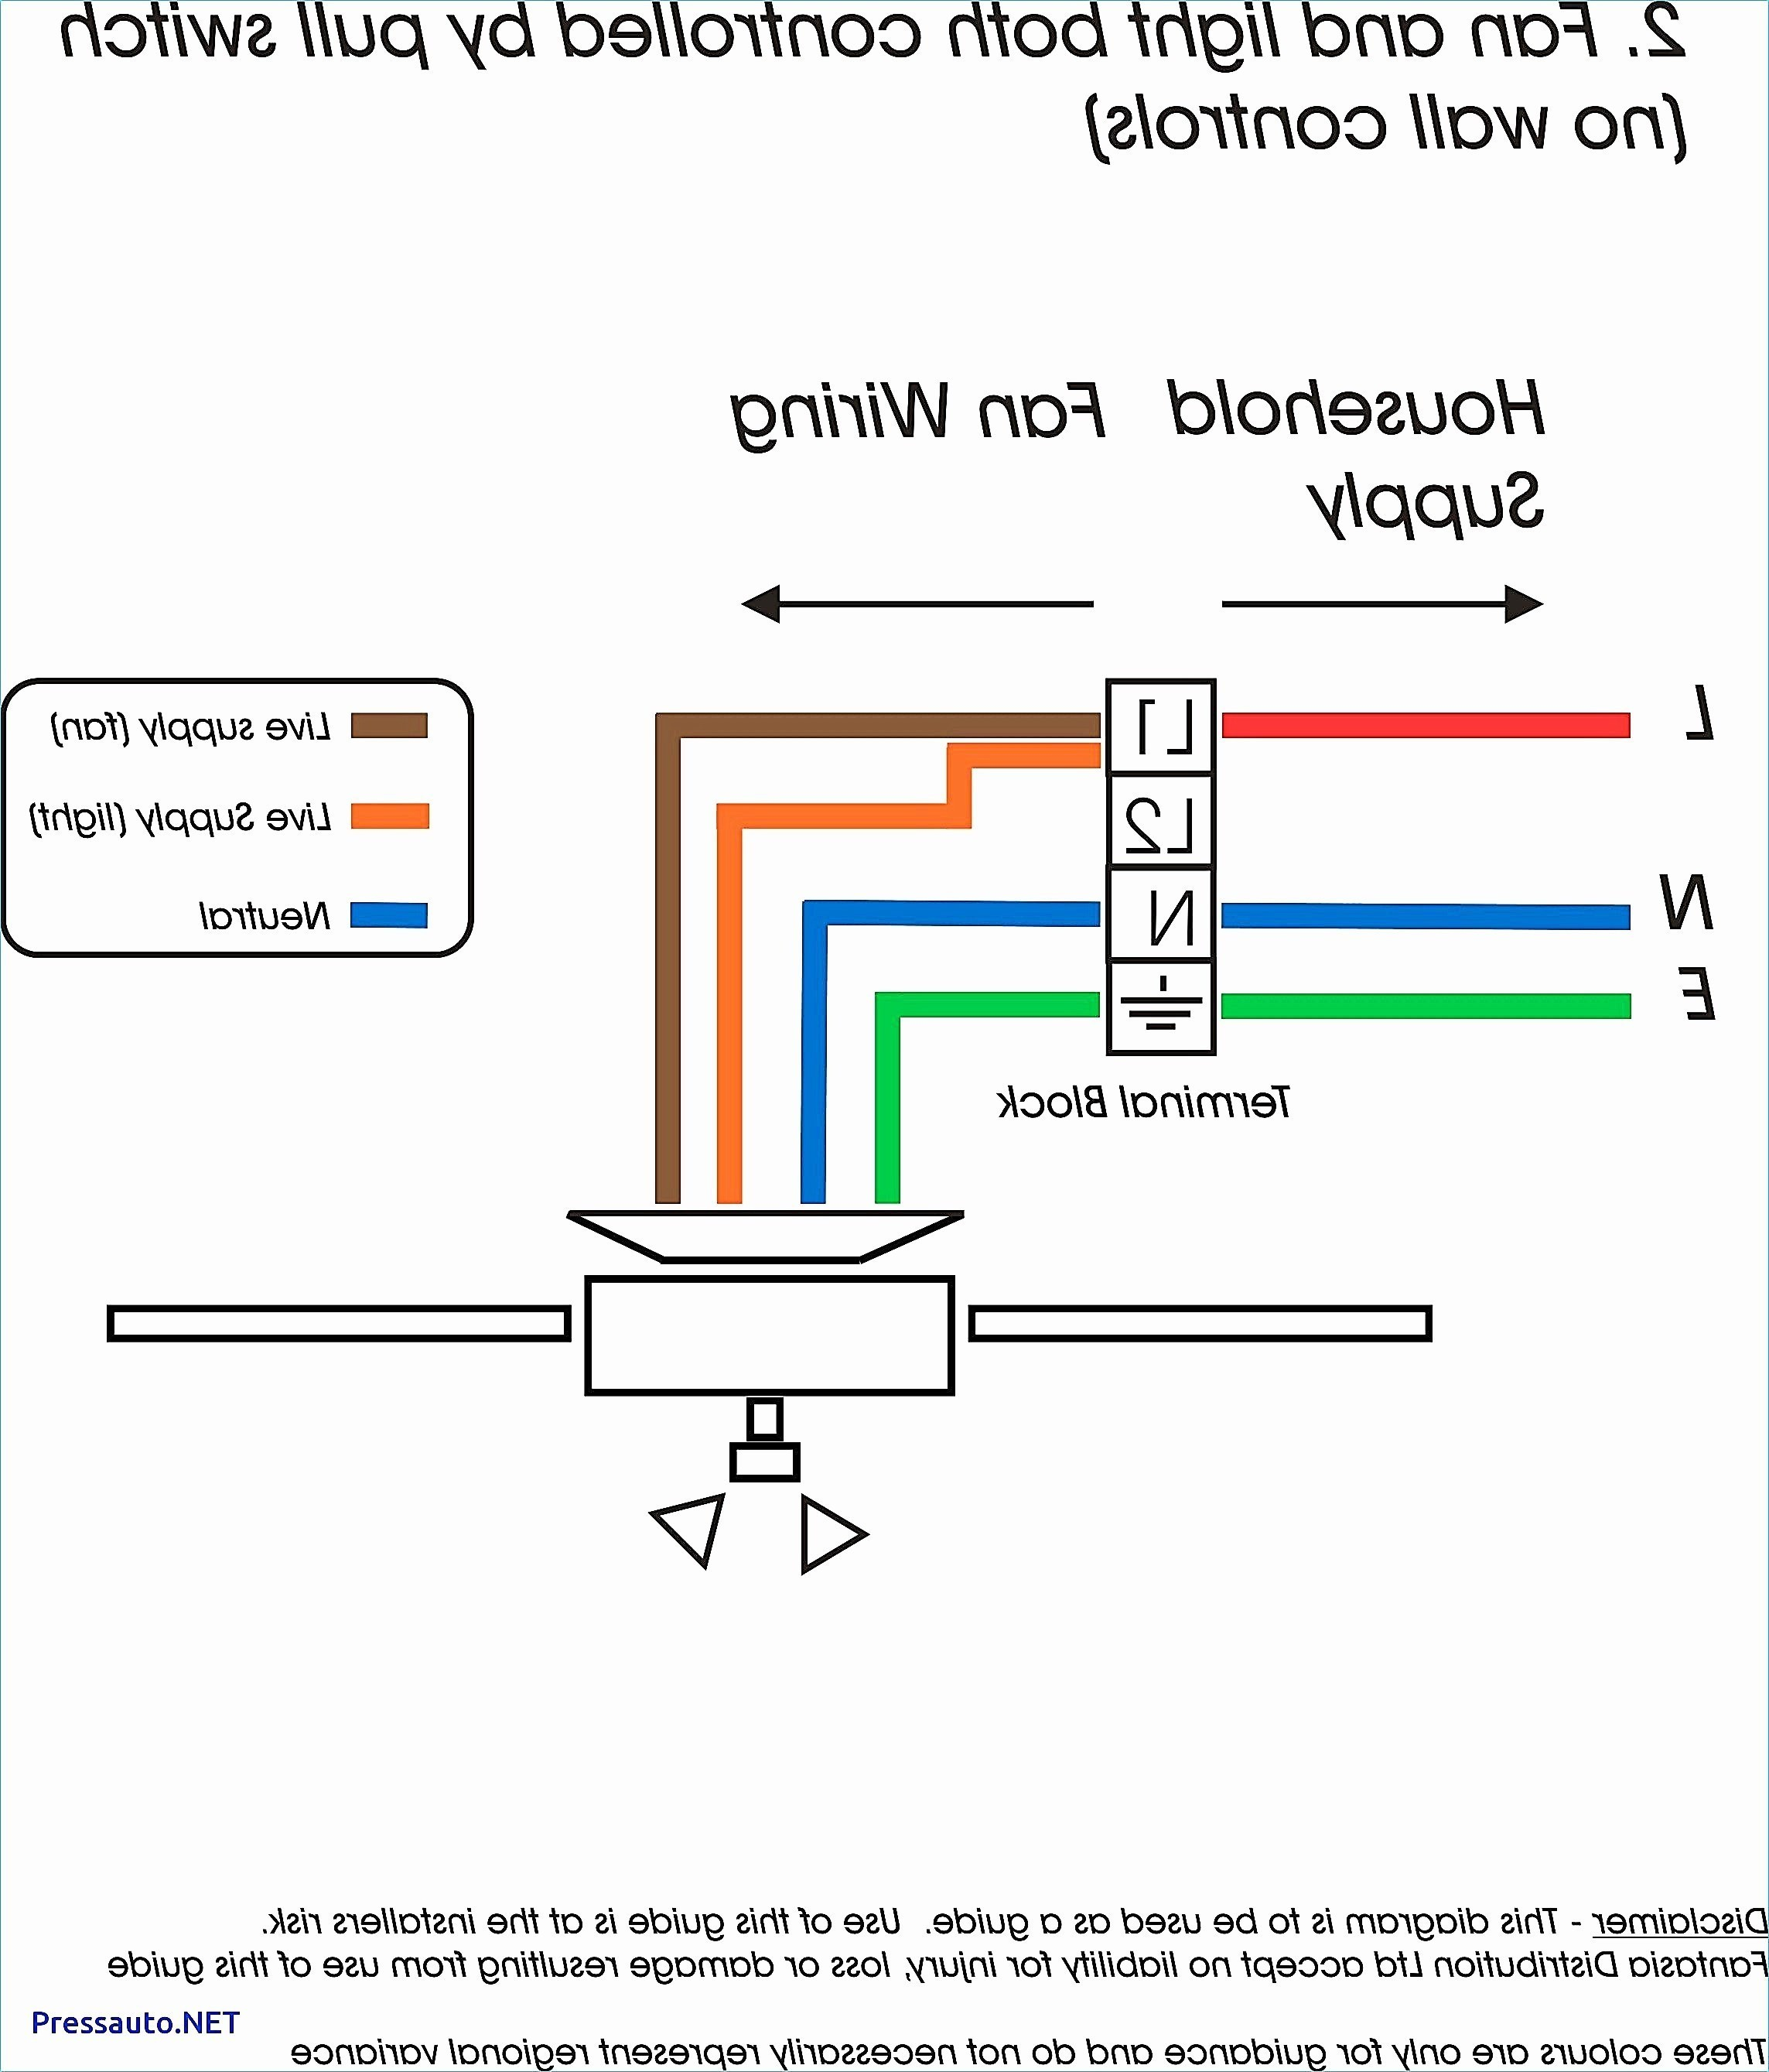 Champion Winch Wiring Diagram   My Wiring DIagram on ramsey rep 8000 solenoid diagram, 12 volt winch wiring diagram, solenoid switch diagram, champion winch wiring diagram, fan motor wiring diagram, atv winch wiring diagram, 4 wheeler winch wiring diagram, dc motor forward reverse wiring diagram, switch wiring diagram, trailer light plug wiring diagram, 3 wire wiring diagram, desert dynamics winch wiring diagram, trailer hitch wiring diagram, venom winch wiring diagram, badland wireless remote wiring diagram, speedometer wiring diagram, overhead crane electrical wiring diagram, winch motor wiring diagram, badland winch solenoid diagram, electric winch wiring diagram,